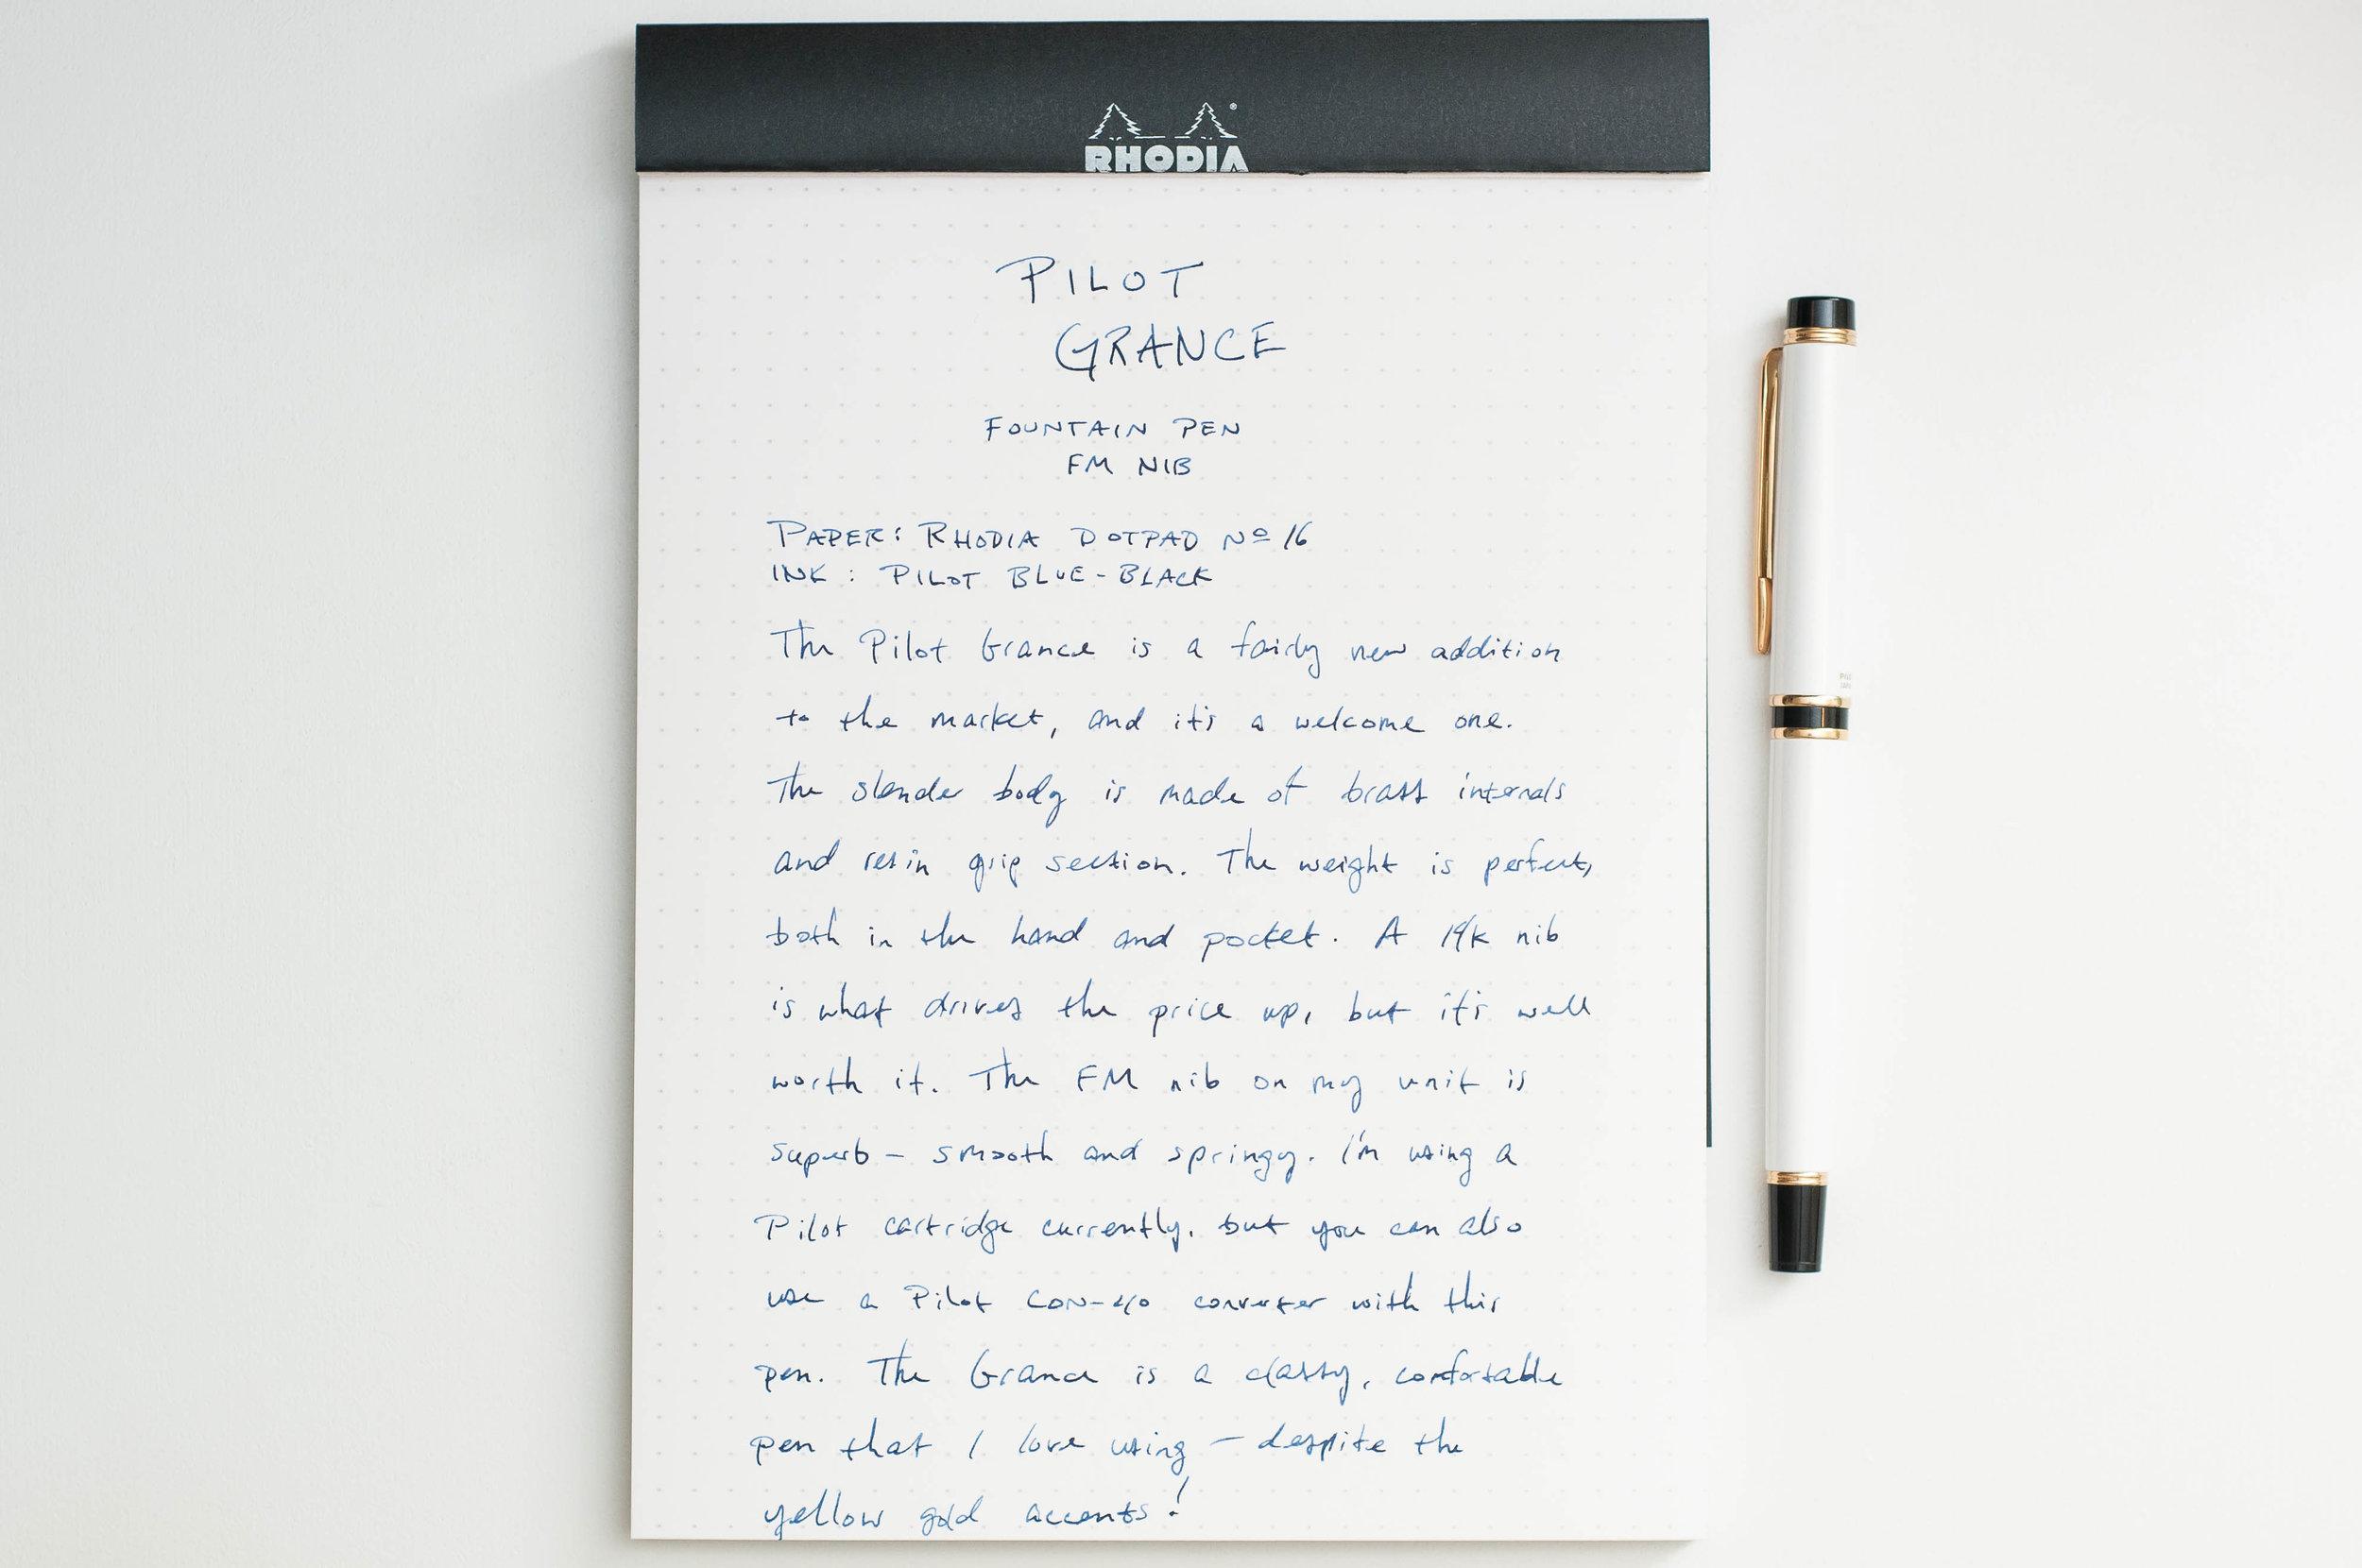 Pilot Grance Fountain Pen Writing